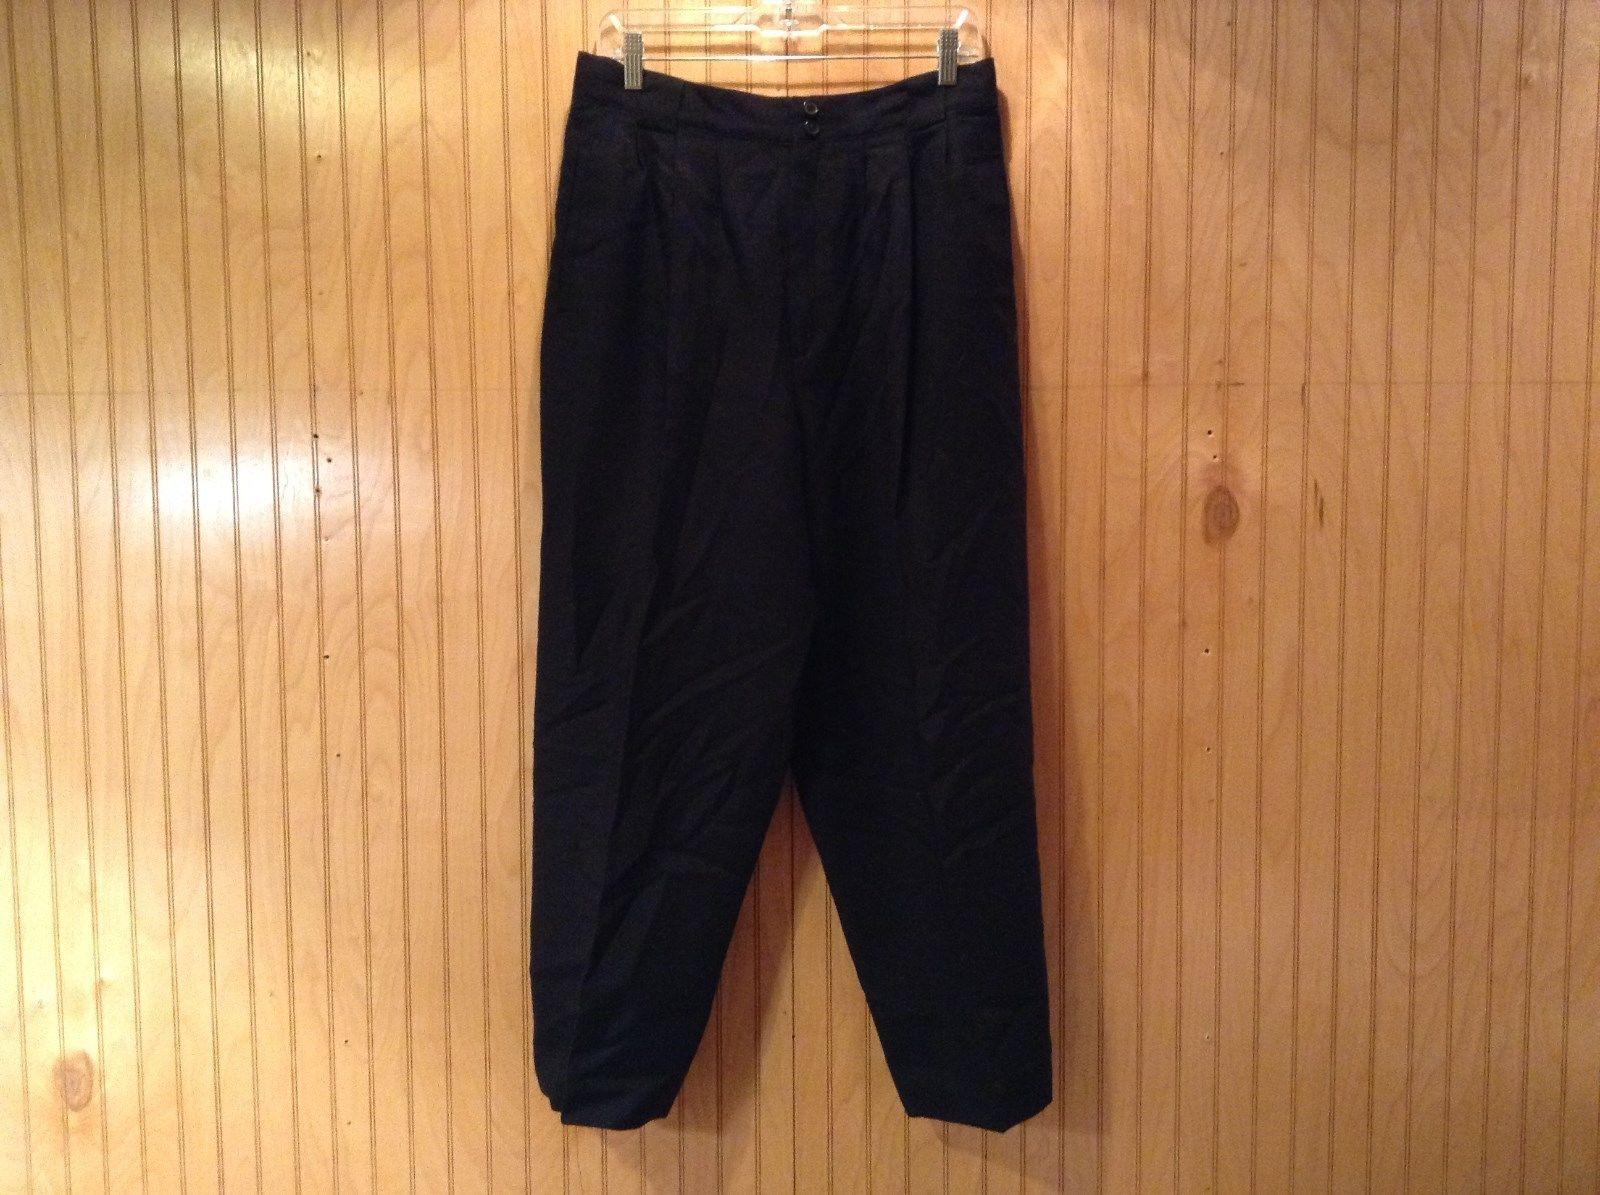 Black Giorgio Saint Angelo 100 Percent Wool Dress Pants Zipper Buttons Closure